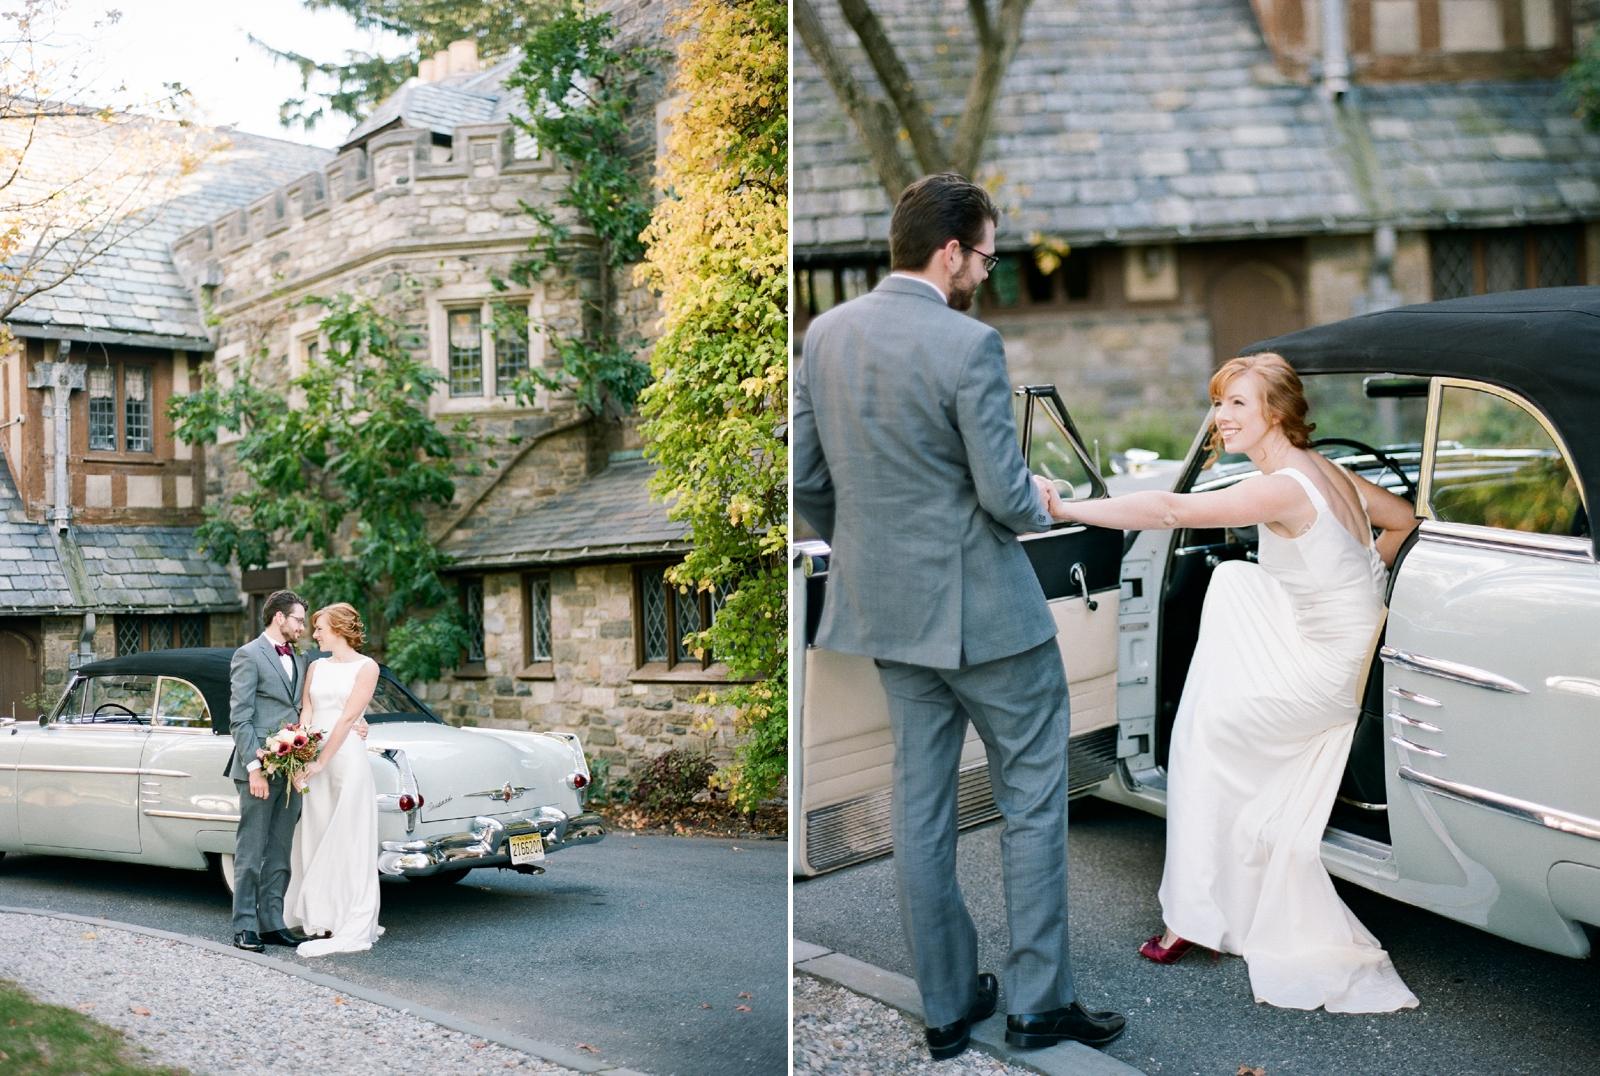 ringwood new jersey wedding photographer shannon griffin_0012.jpg